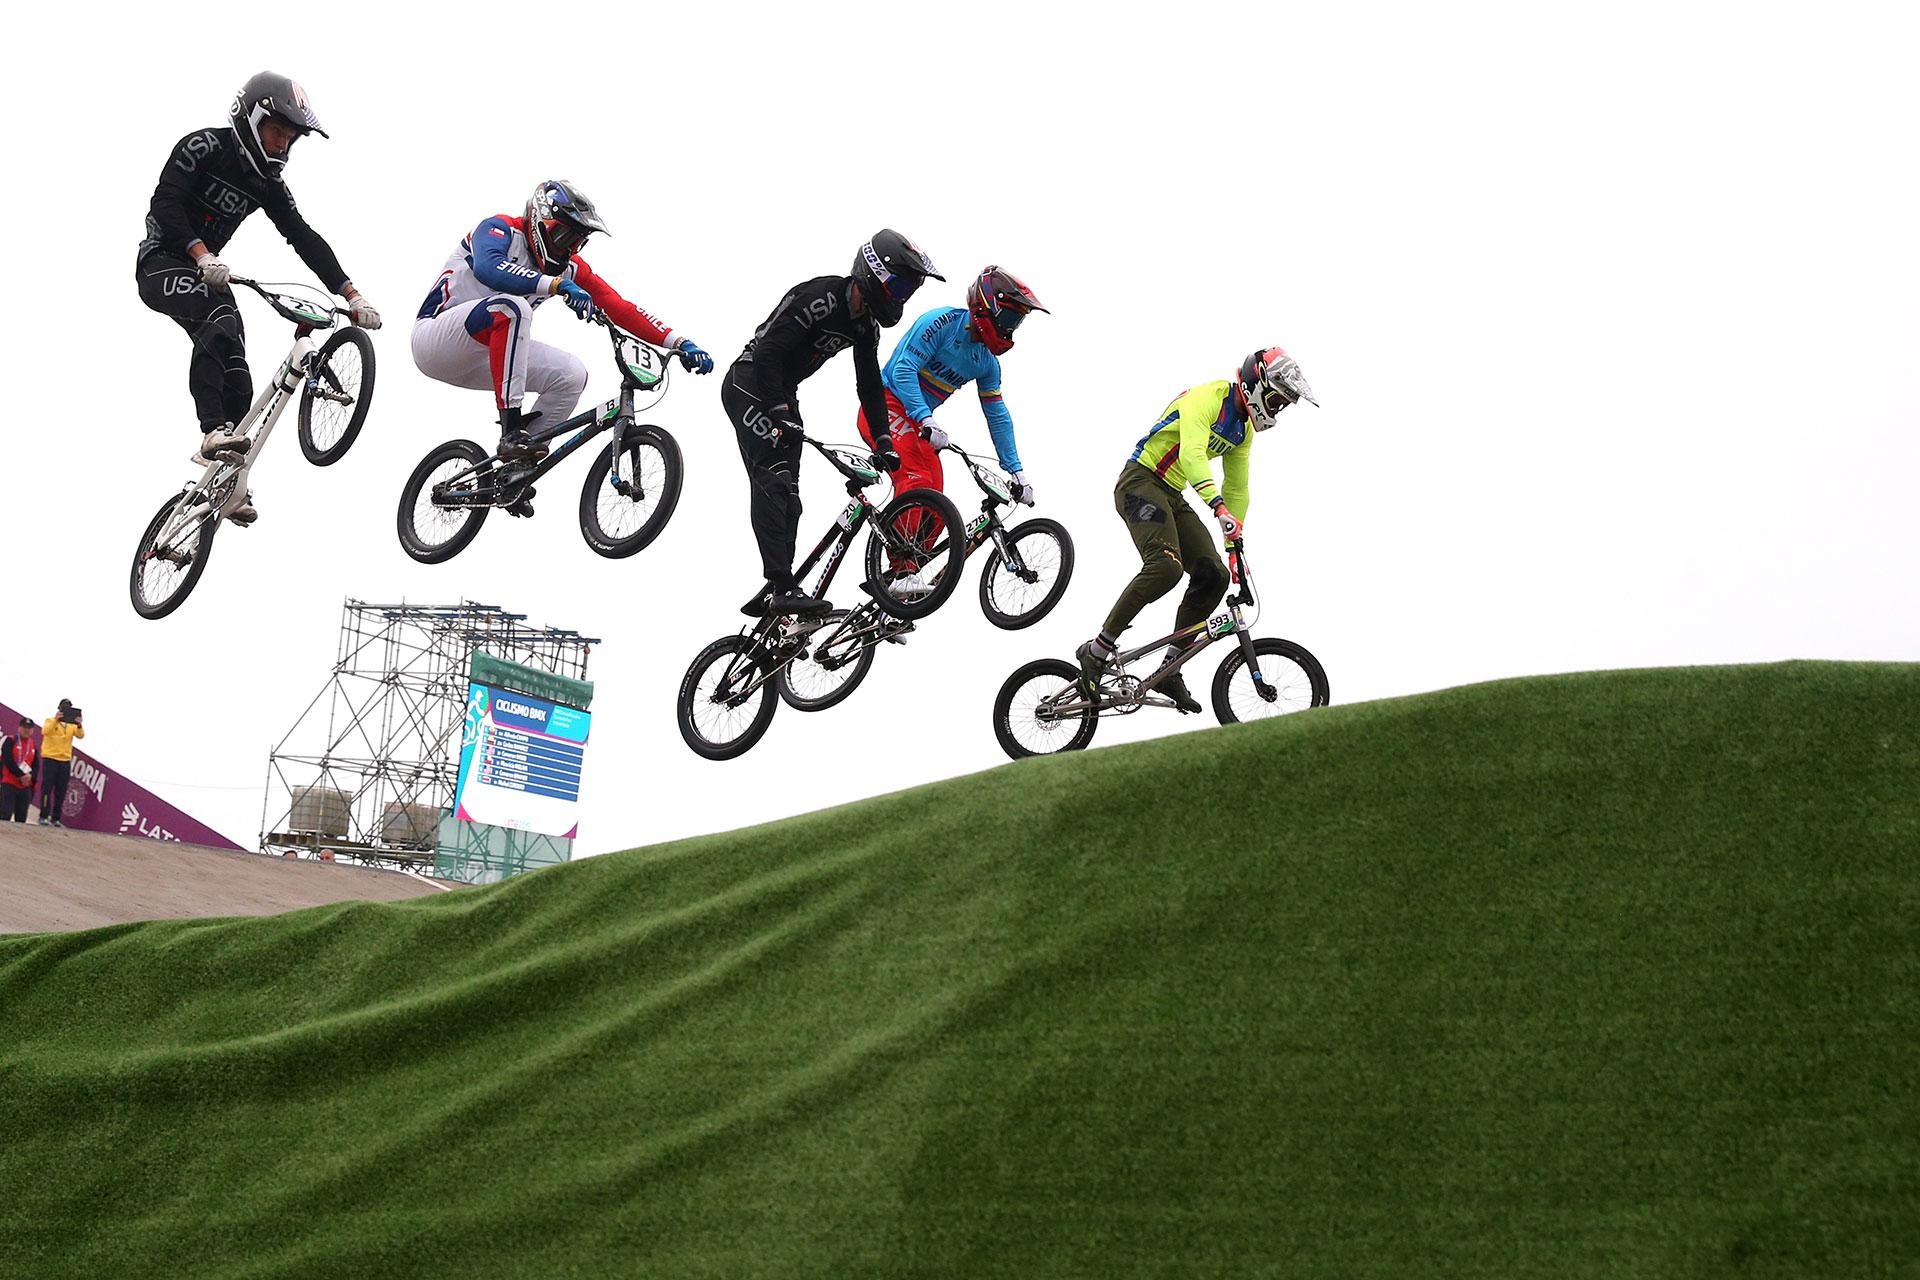 XVIII Pan American Games - Lima 2019 - Cycling BMX - Men's Semifinal  - Costa Verde Beach Circuit, Lima, Peru - August 9, 2019. Athletes compete. REUTERS/Pilar Olivares